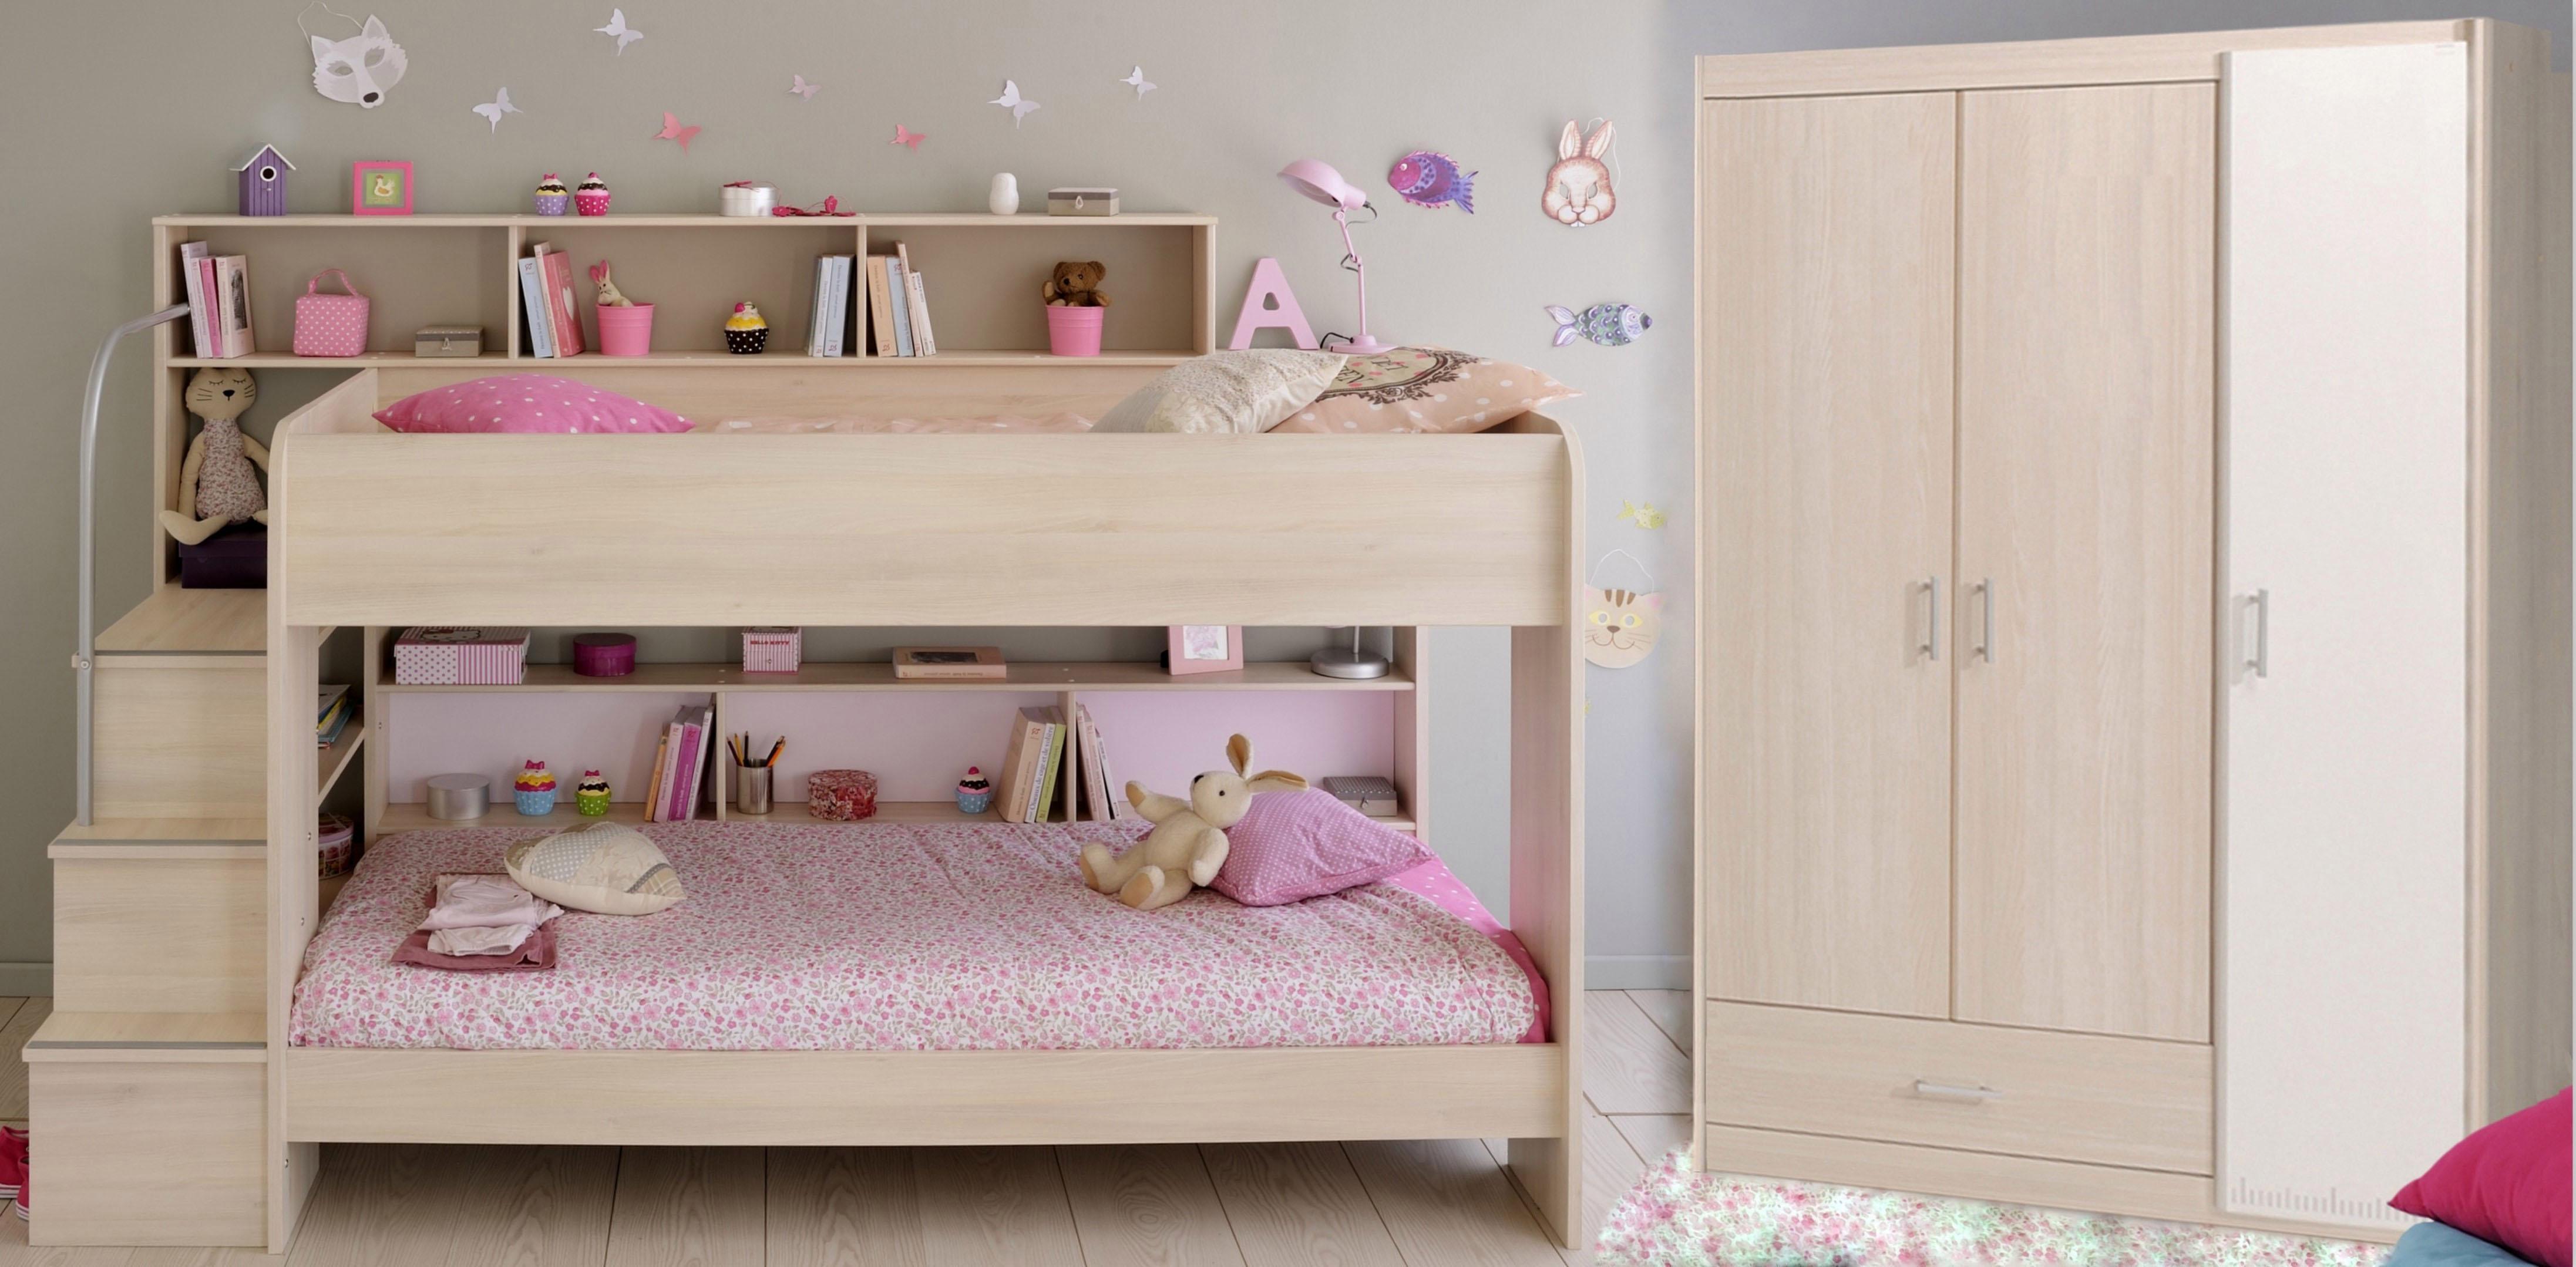 Parisot Kinderzimmer-Set »Bibop« (2-tlg.) | Kinderzimmer > Komplett-Kinderzimmer | Braun | PARISOT